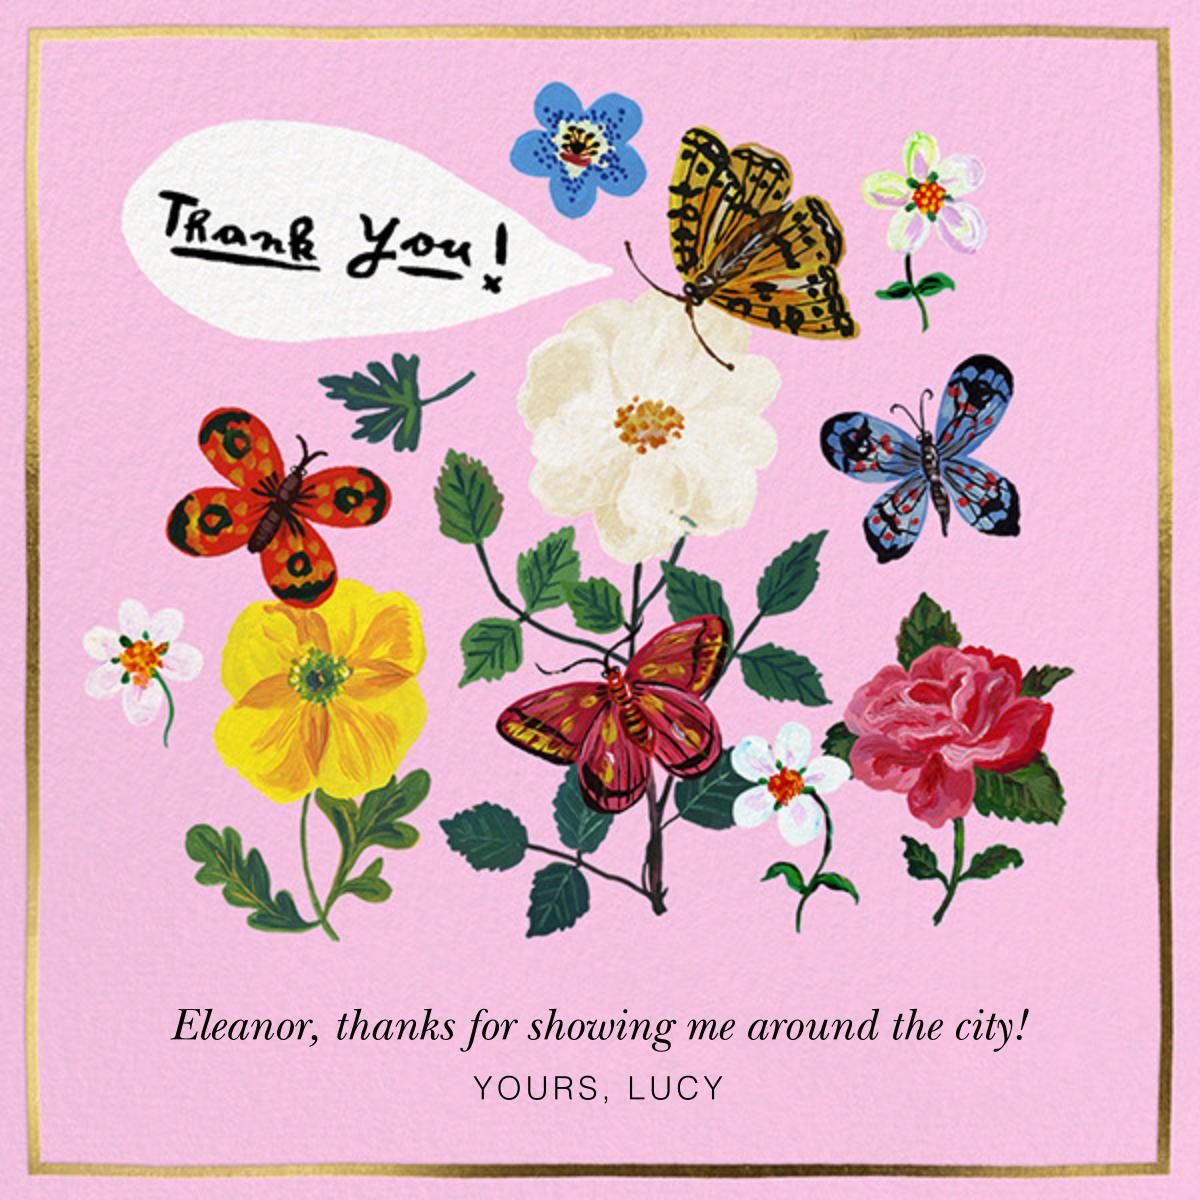 Papillons Dansants - Carnation - Nathalie Lété - Thank you